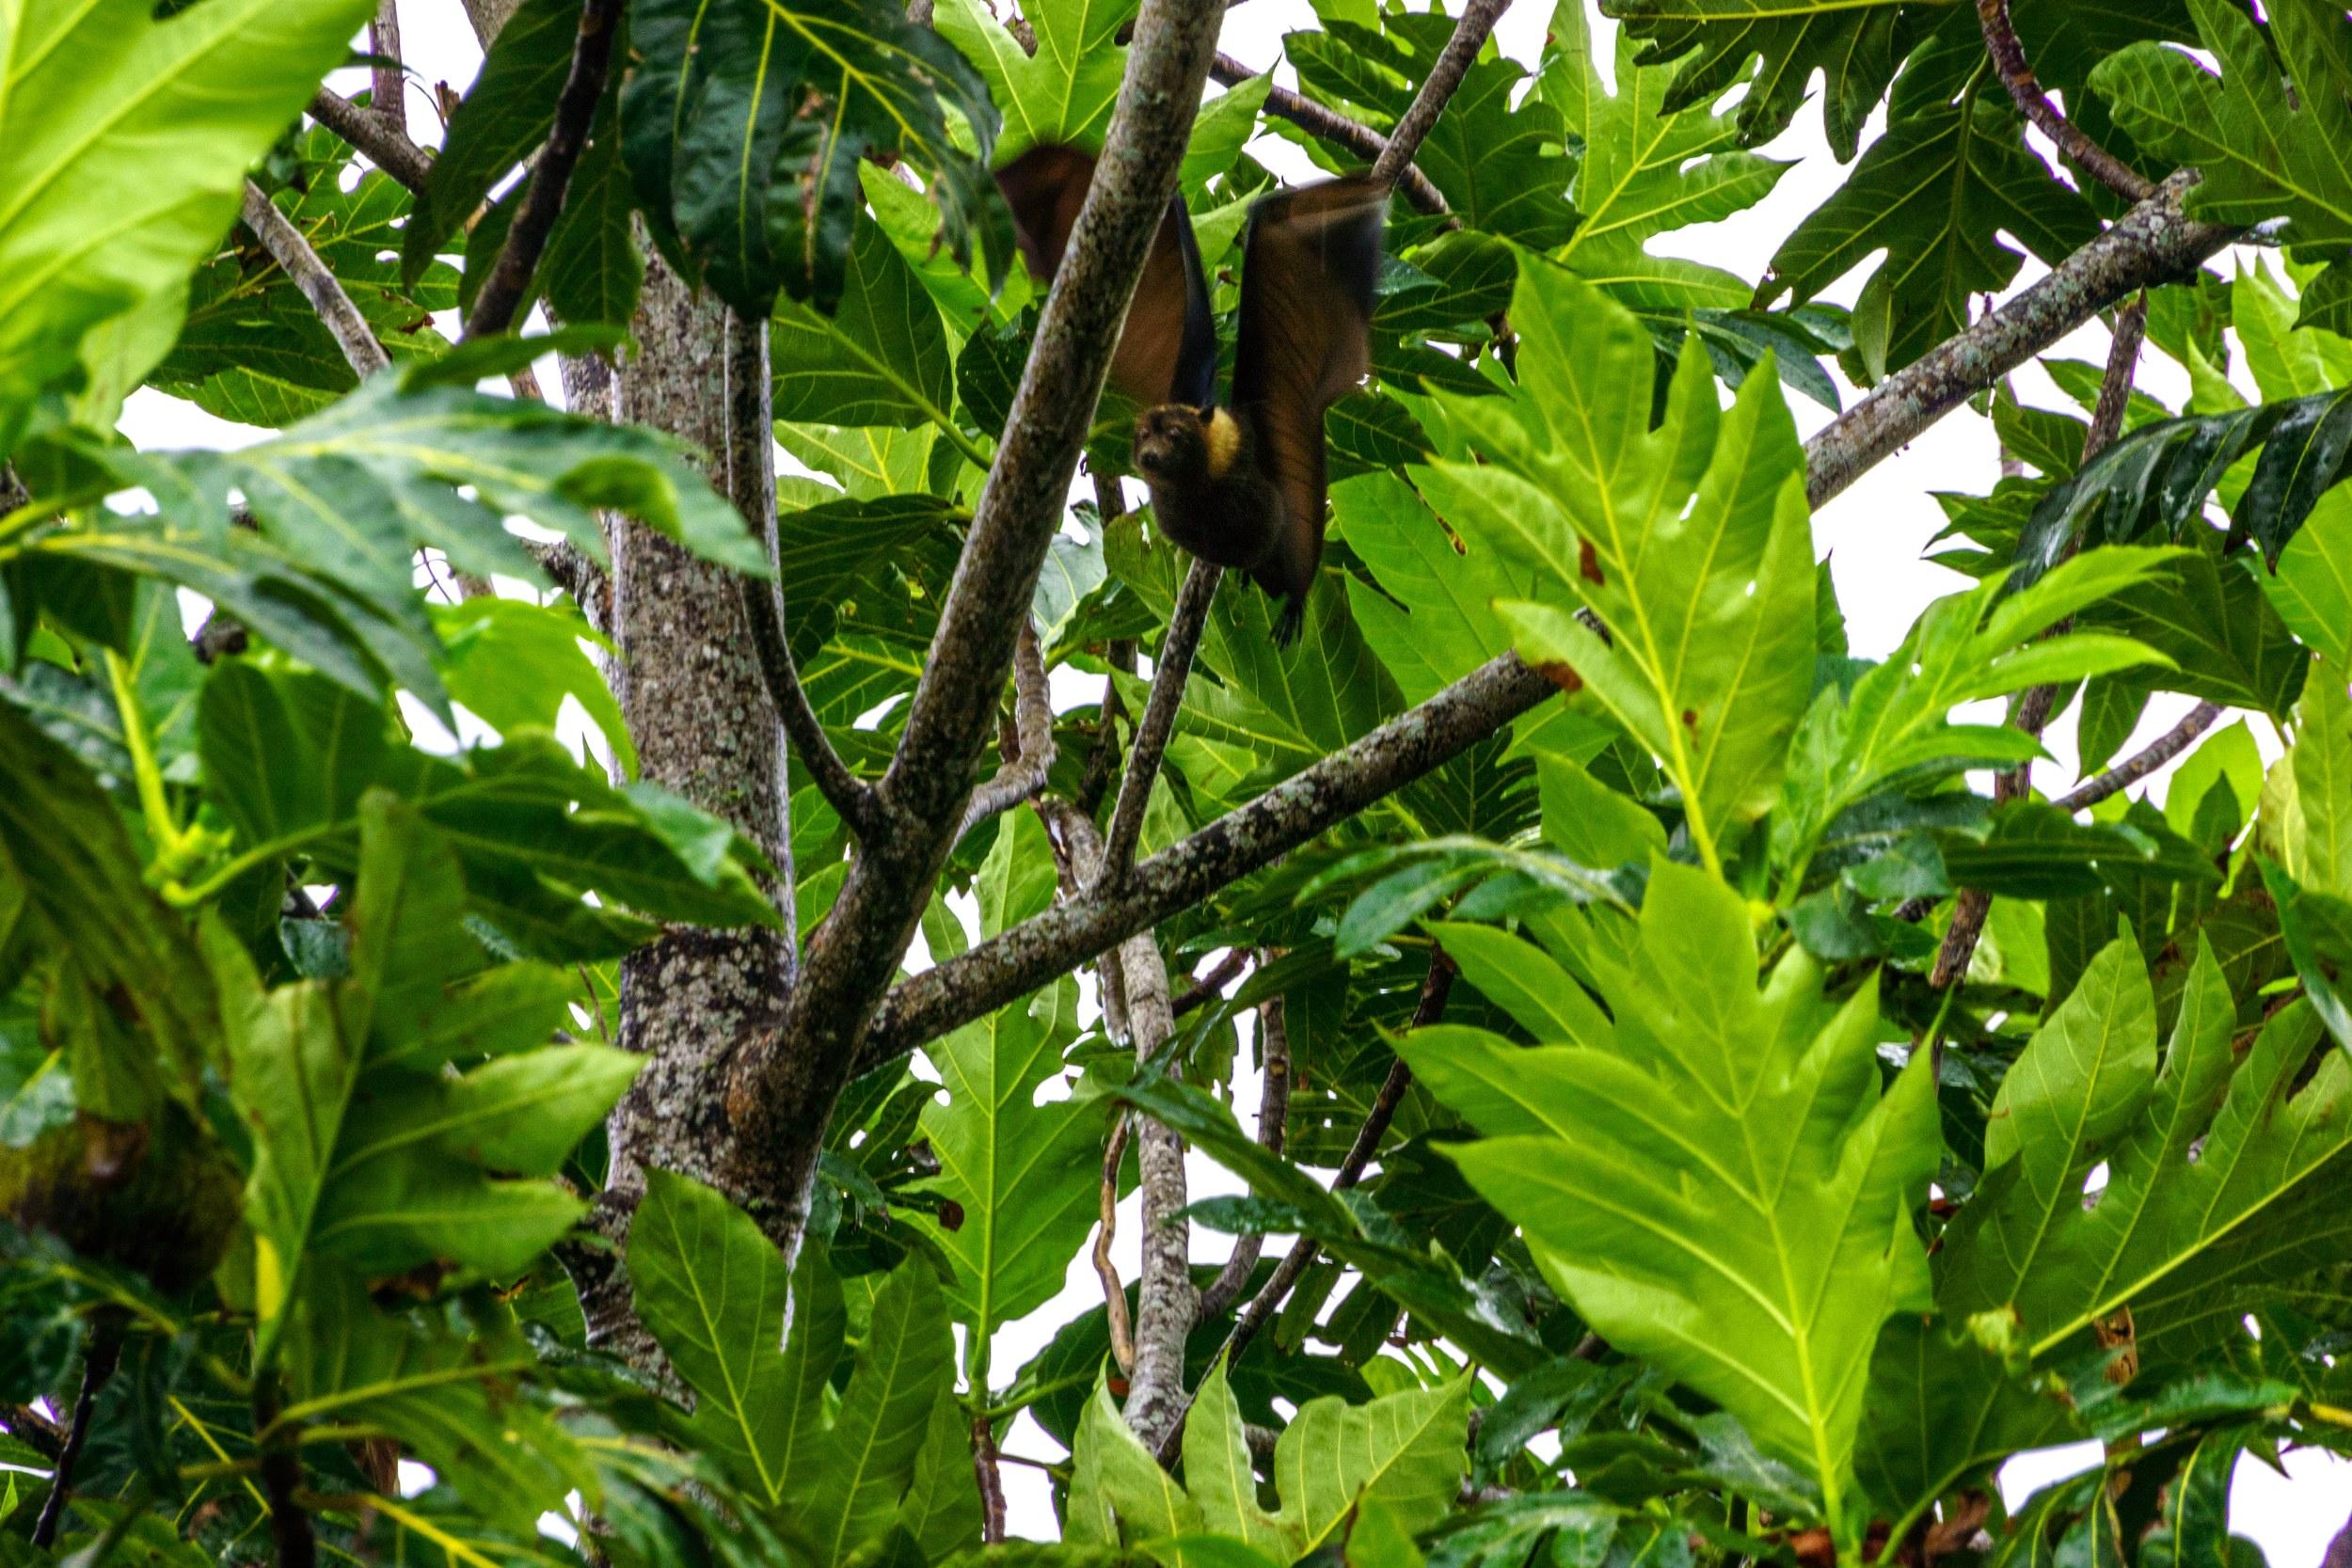 Bat in the Breadfruit Tree (c) Claudia Jocher 2014